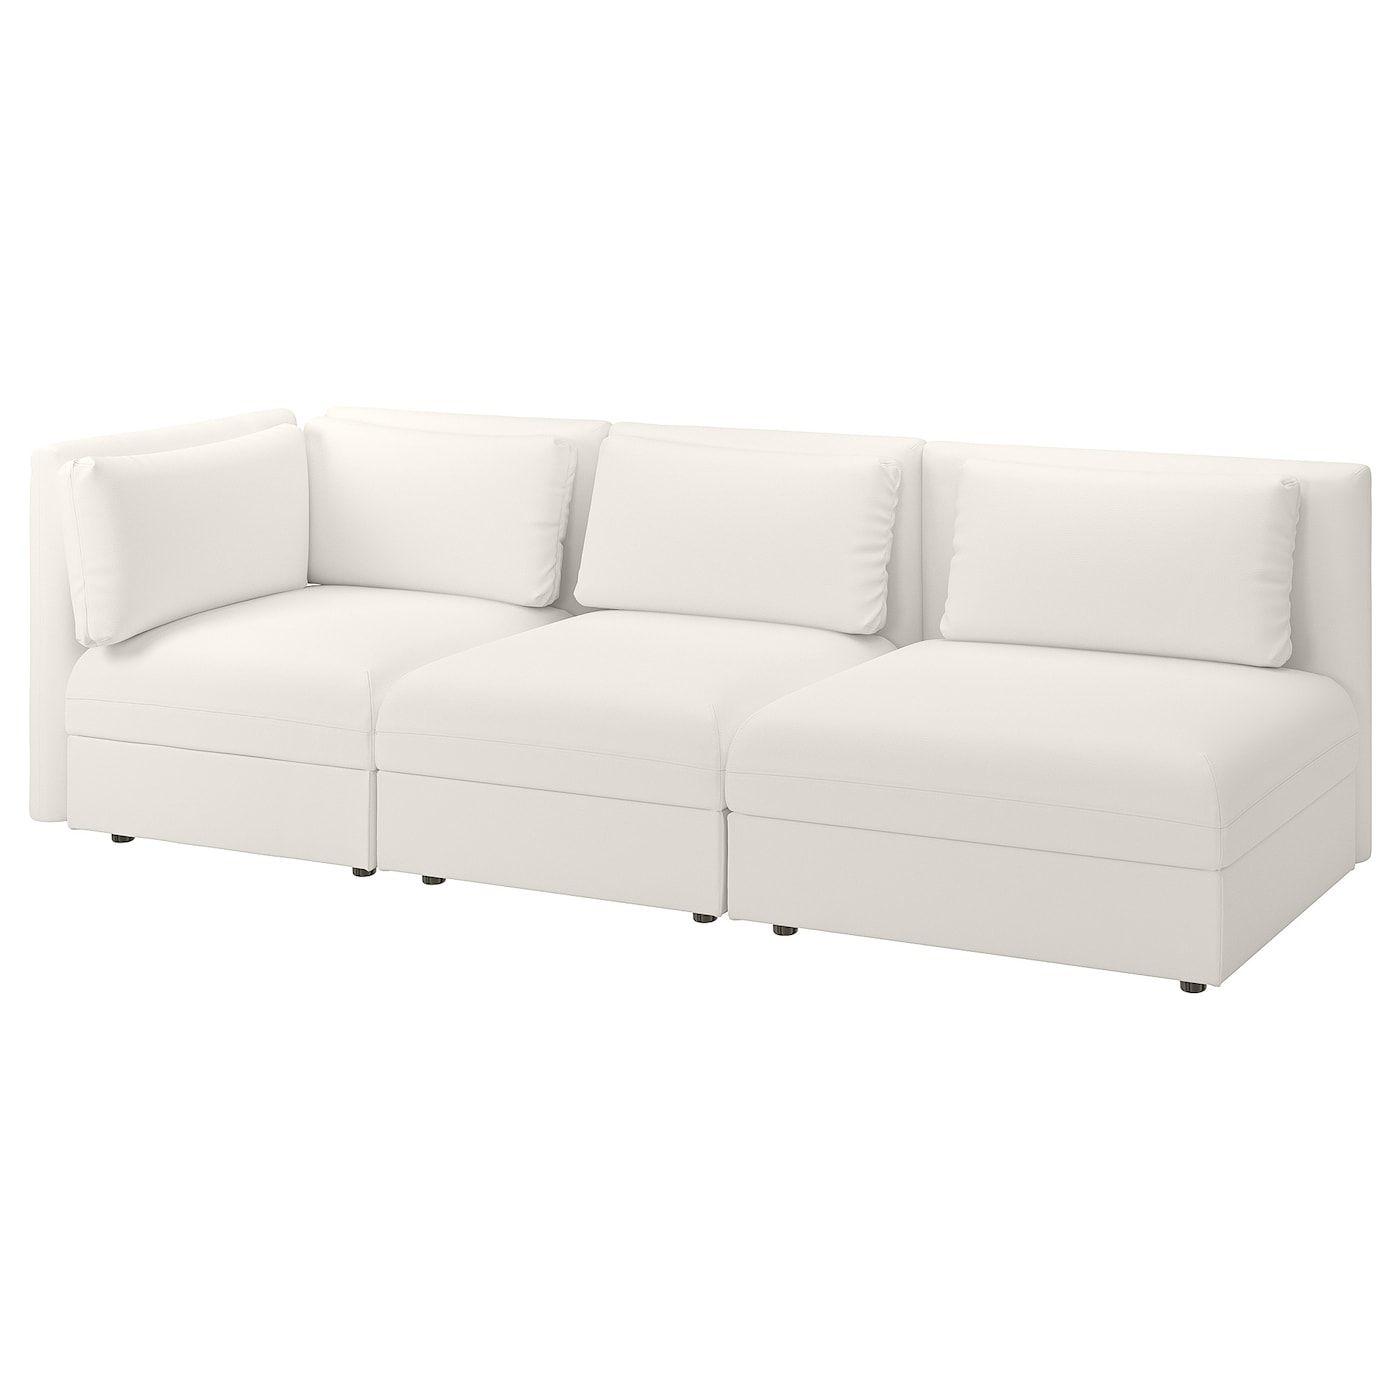 Vallentuna Sectional 3 Seat With Open End And Storage Murum White Flexible Furniture Modular Sofa Ikea